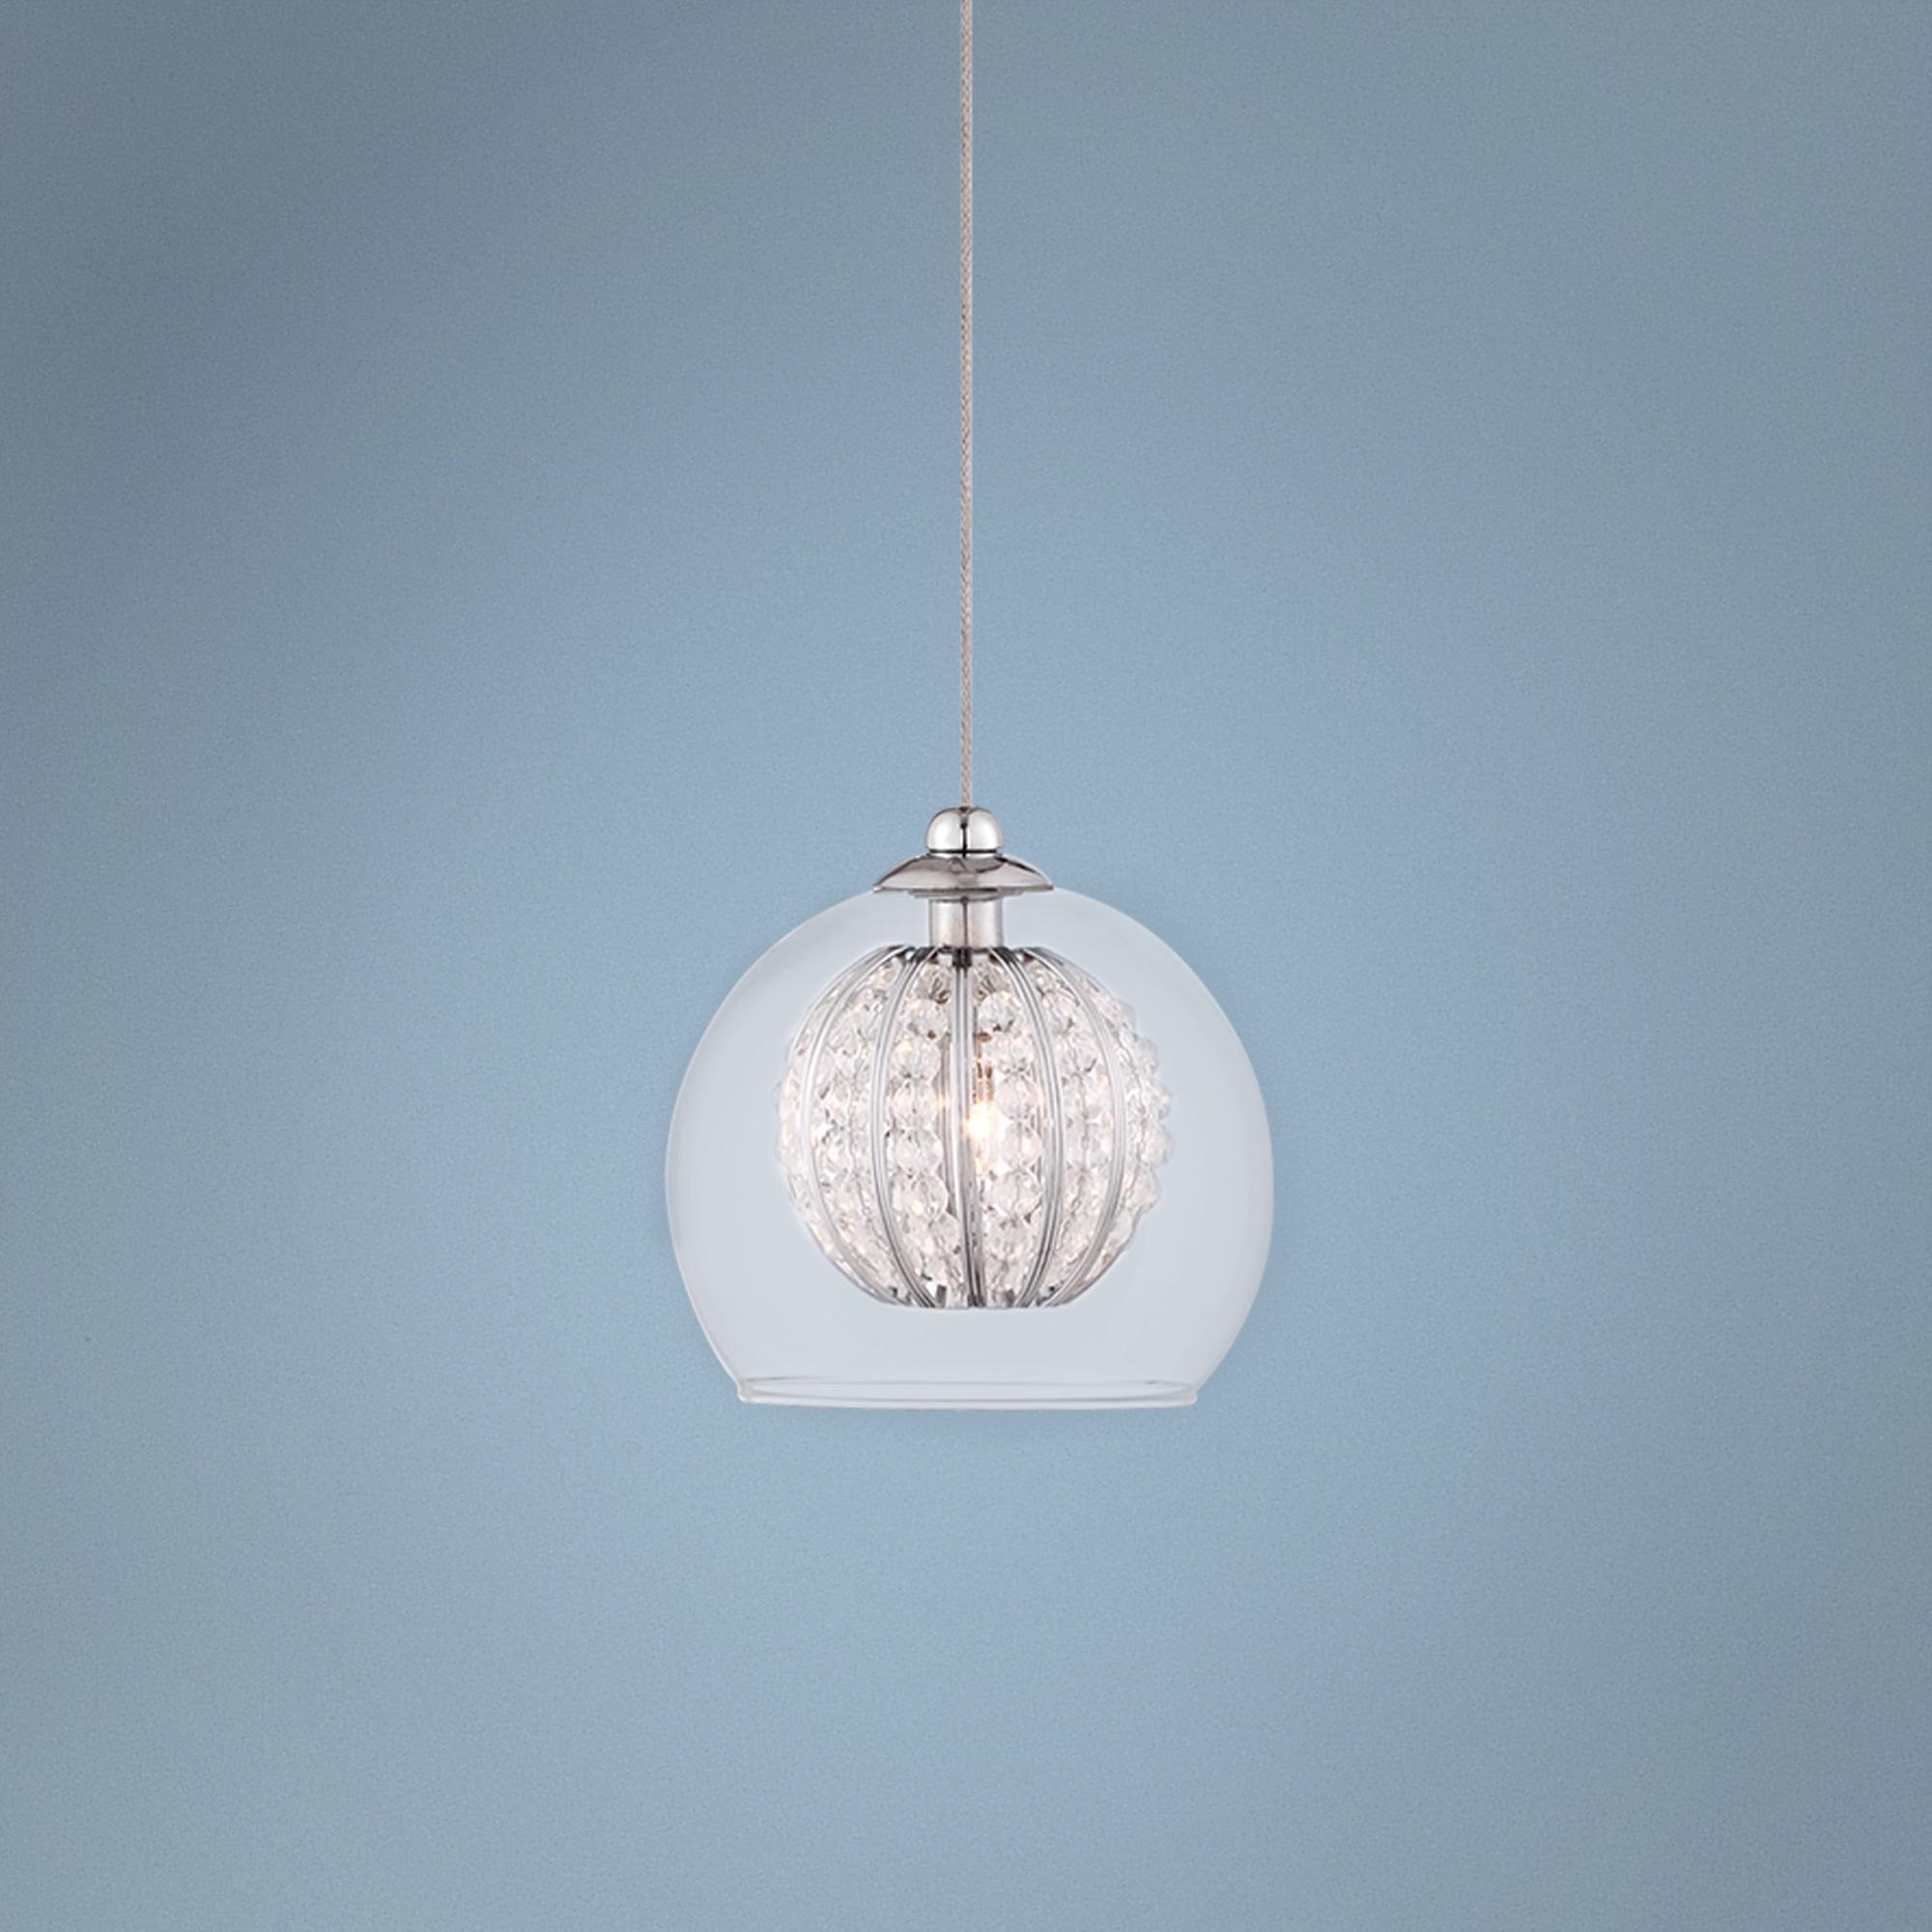 Possini Euro Onida 4 1 W Clear Crystal Glass Mini Pendant Farmhouse Lightingkitchen